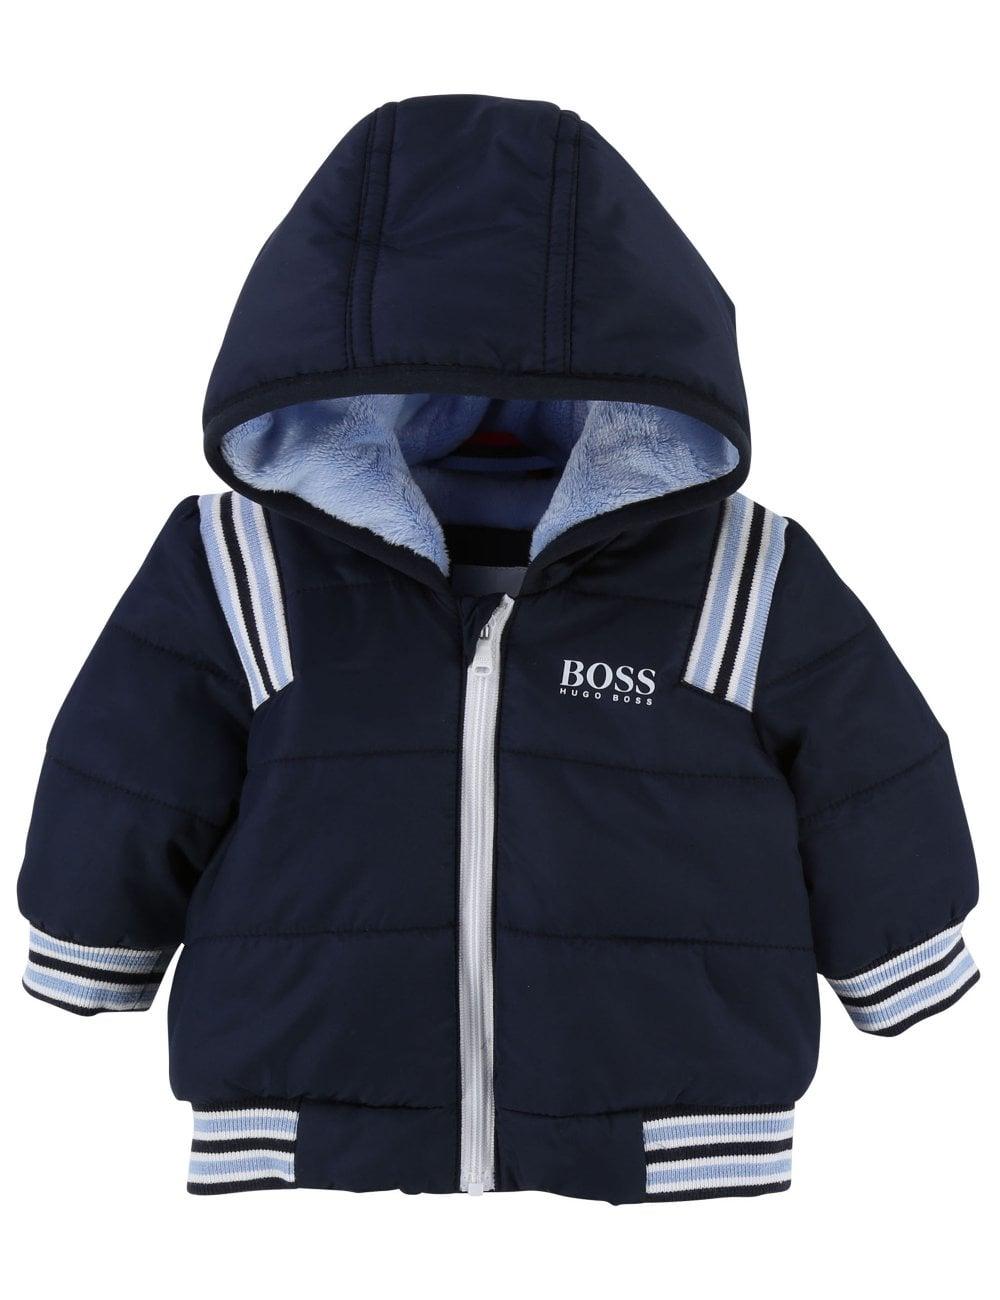 a6f53e730 Hugo Boss Kids Baby Boys Puffer Jacket